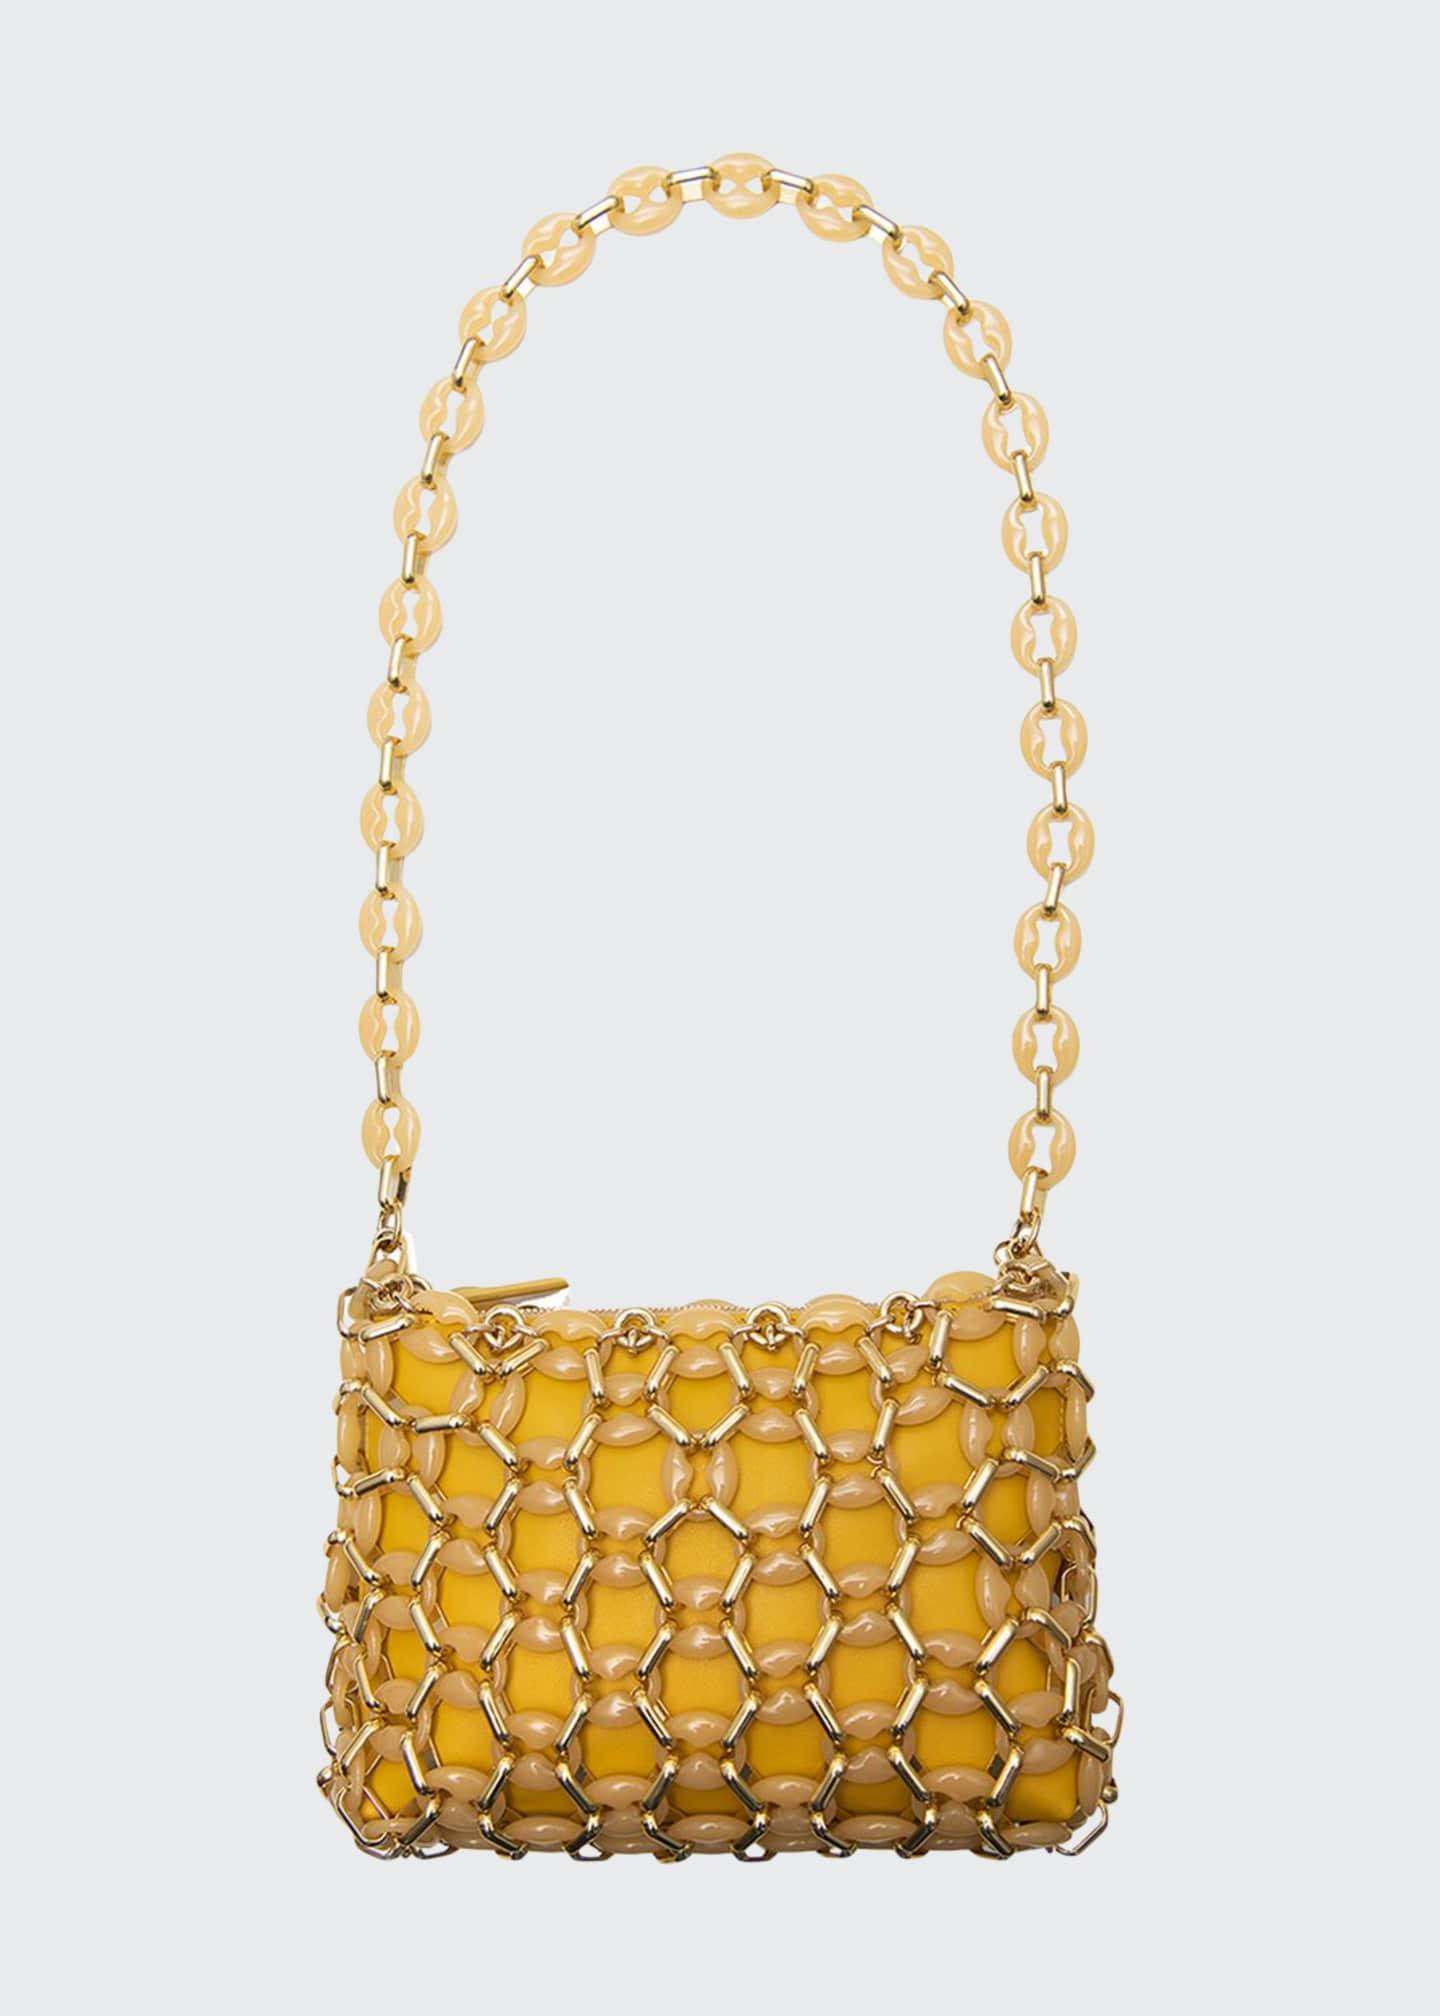 BY FAR Capria Chain Shoulder Bag, Yellow